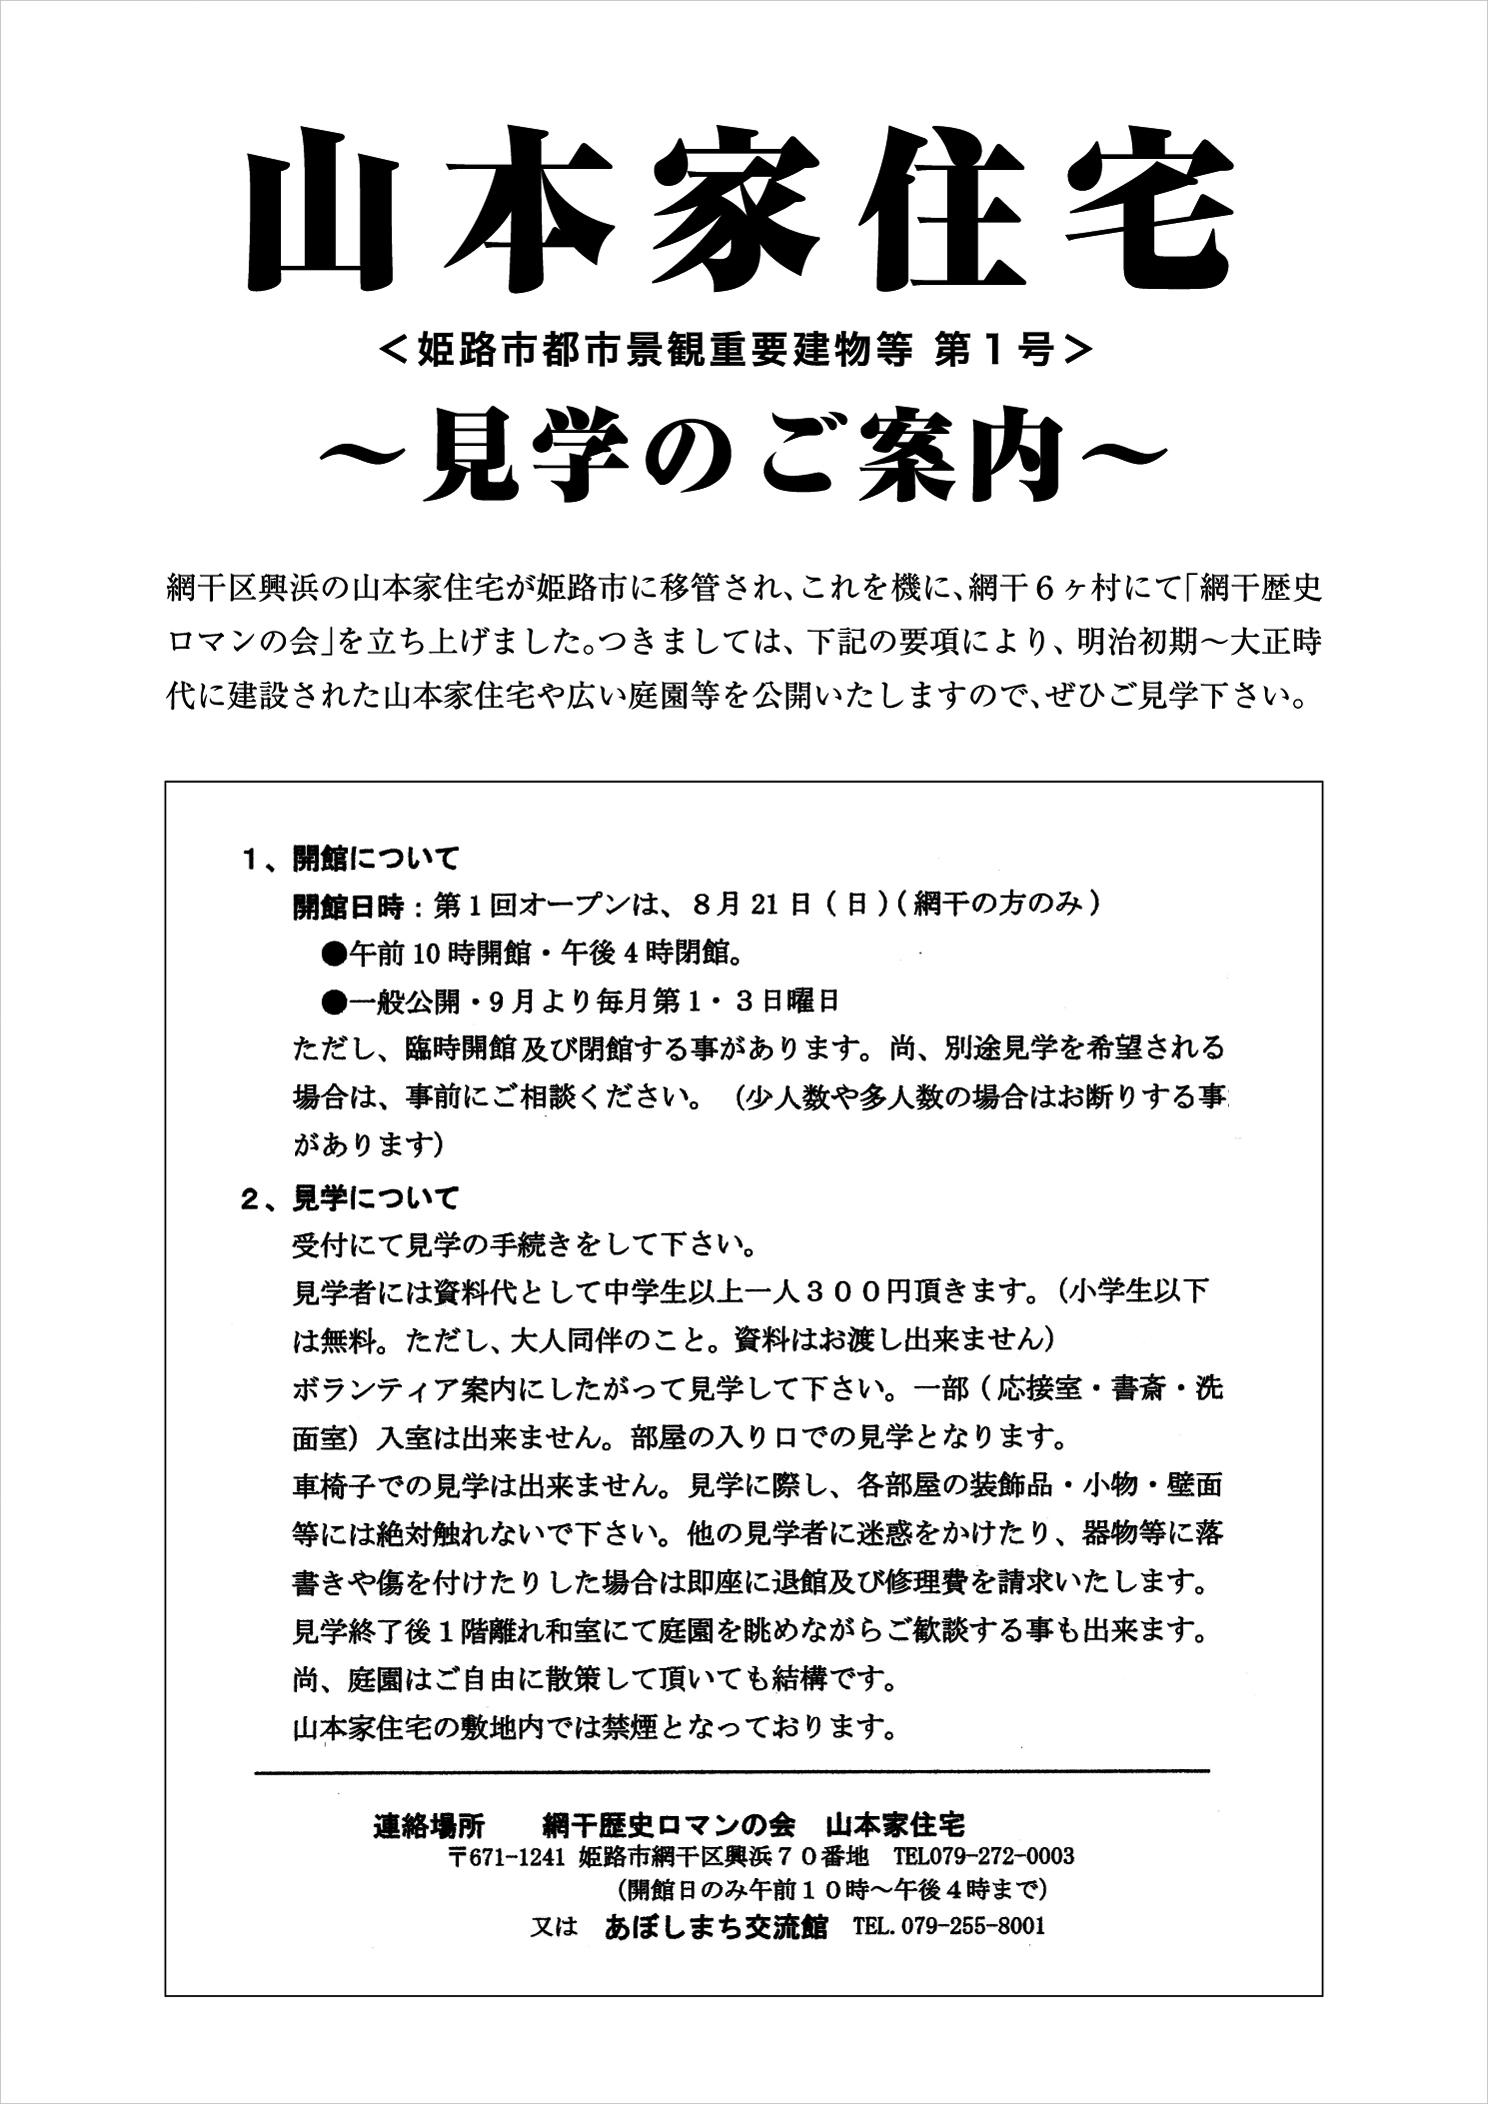 http://aboshimachi.com/y-info-2.jpg